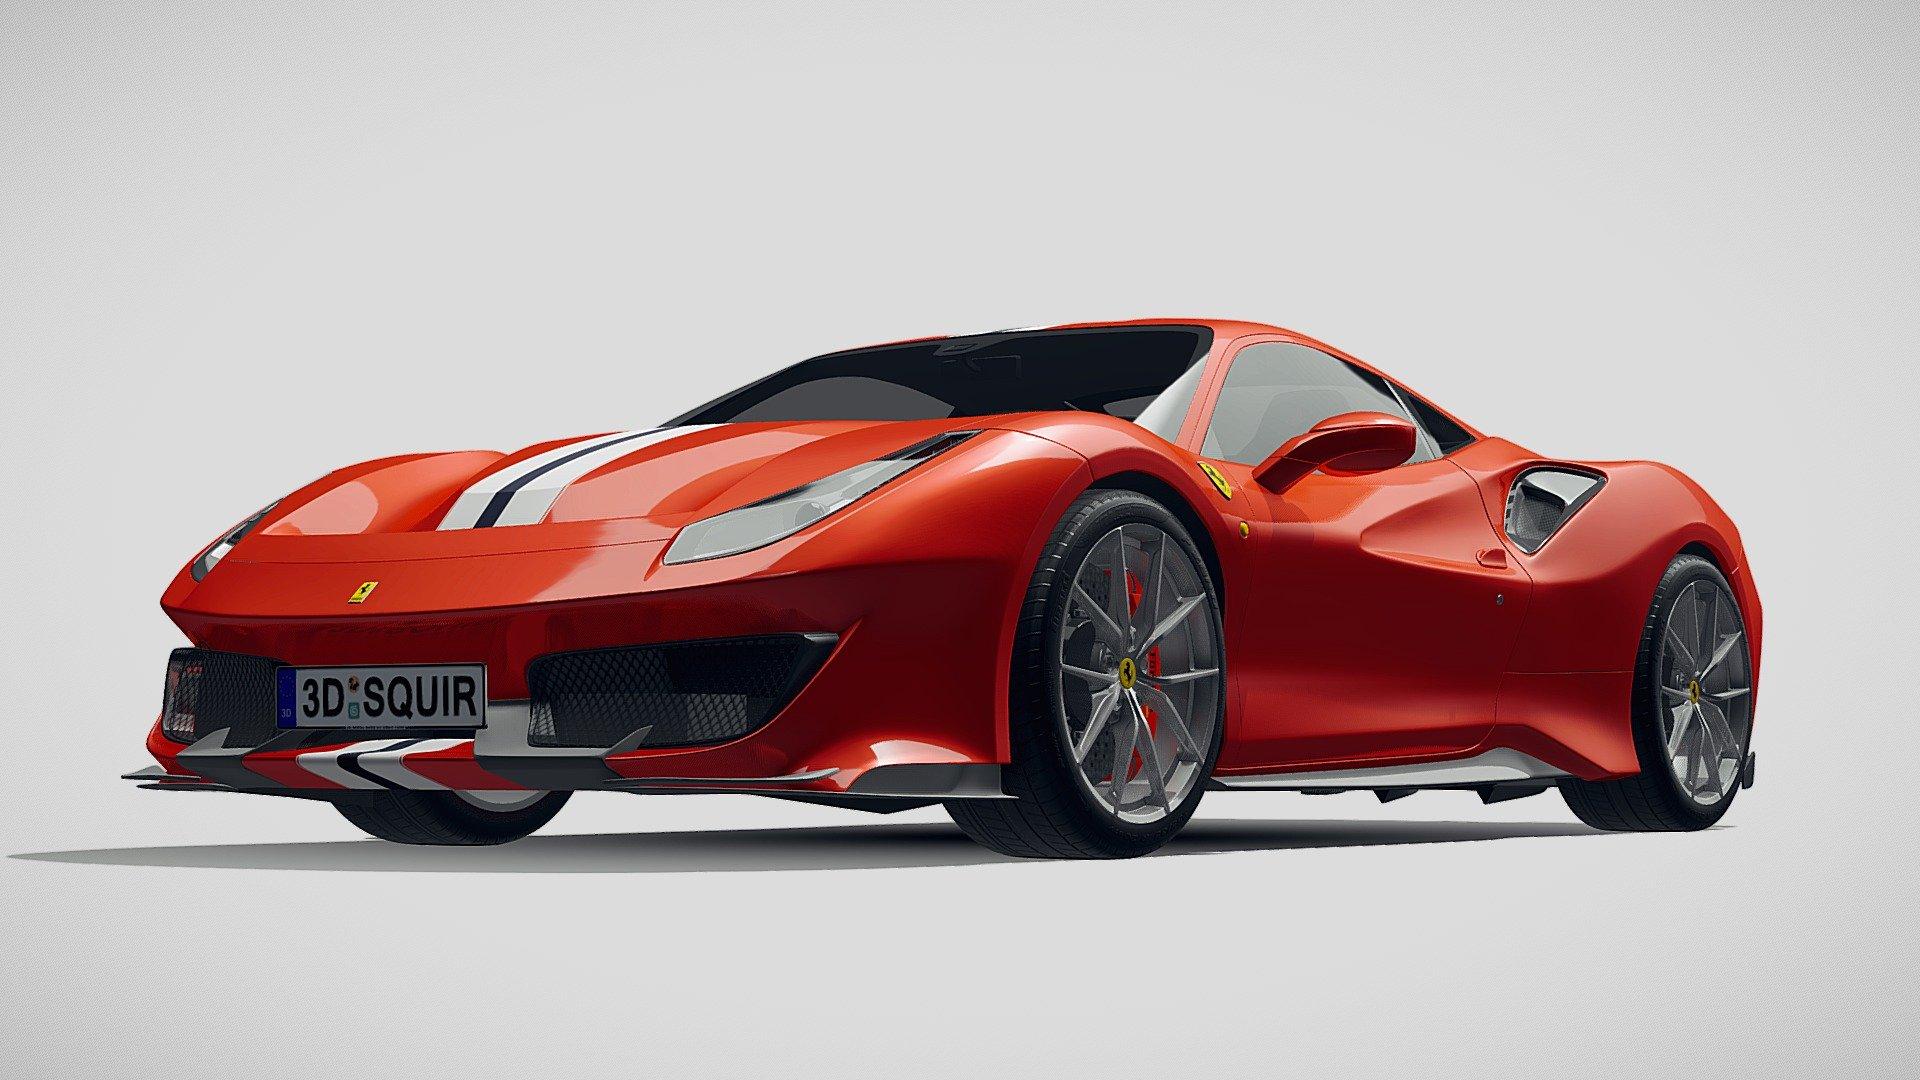 Ferrari 488 Pista 2019 Buy Royalty Free 3d Model By Squir3d Squir3d Bd3b59a